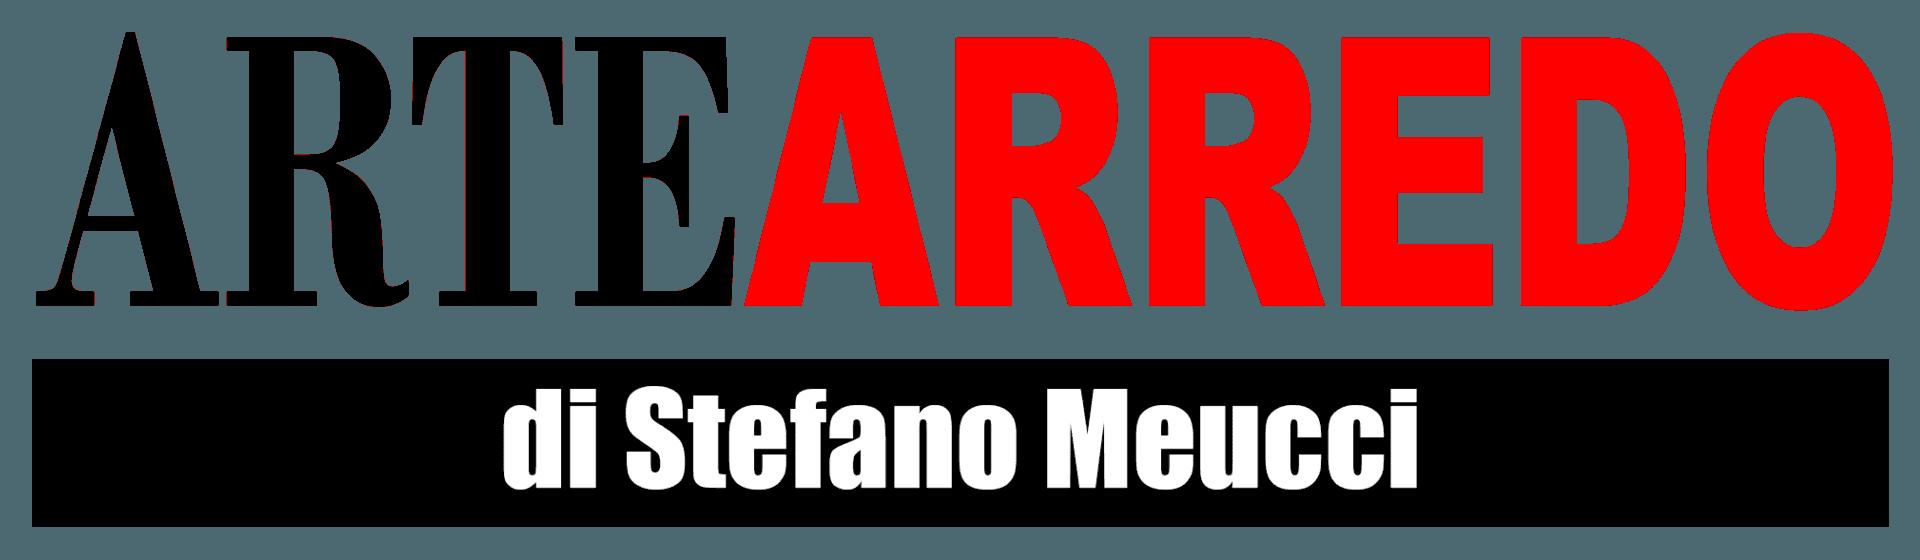 ARTE ARREDO - LOGO